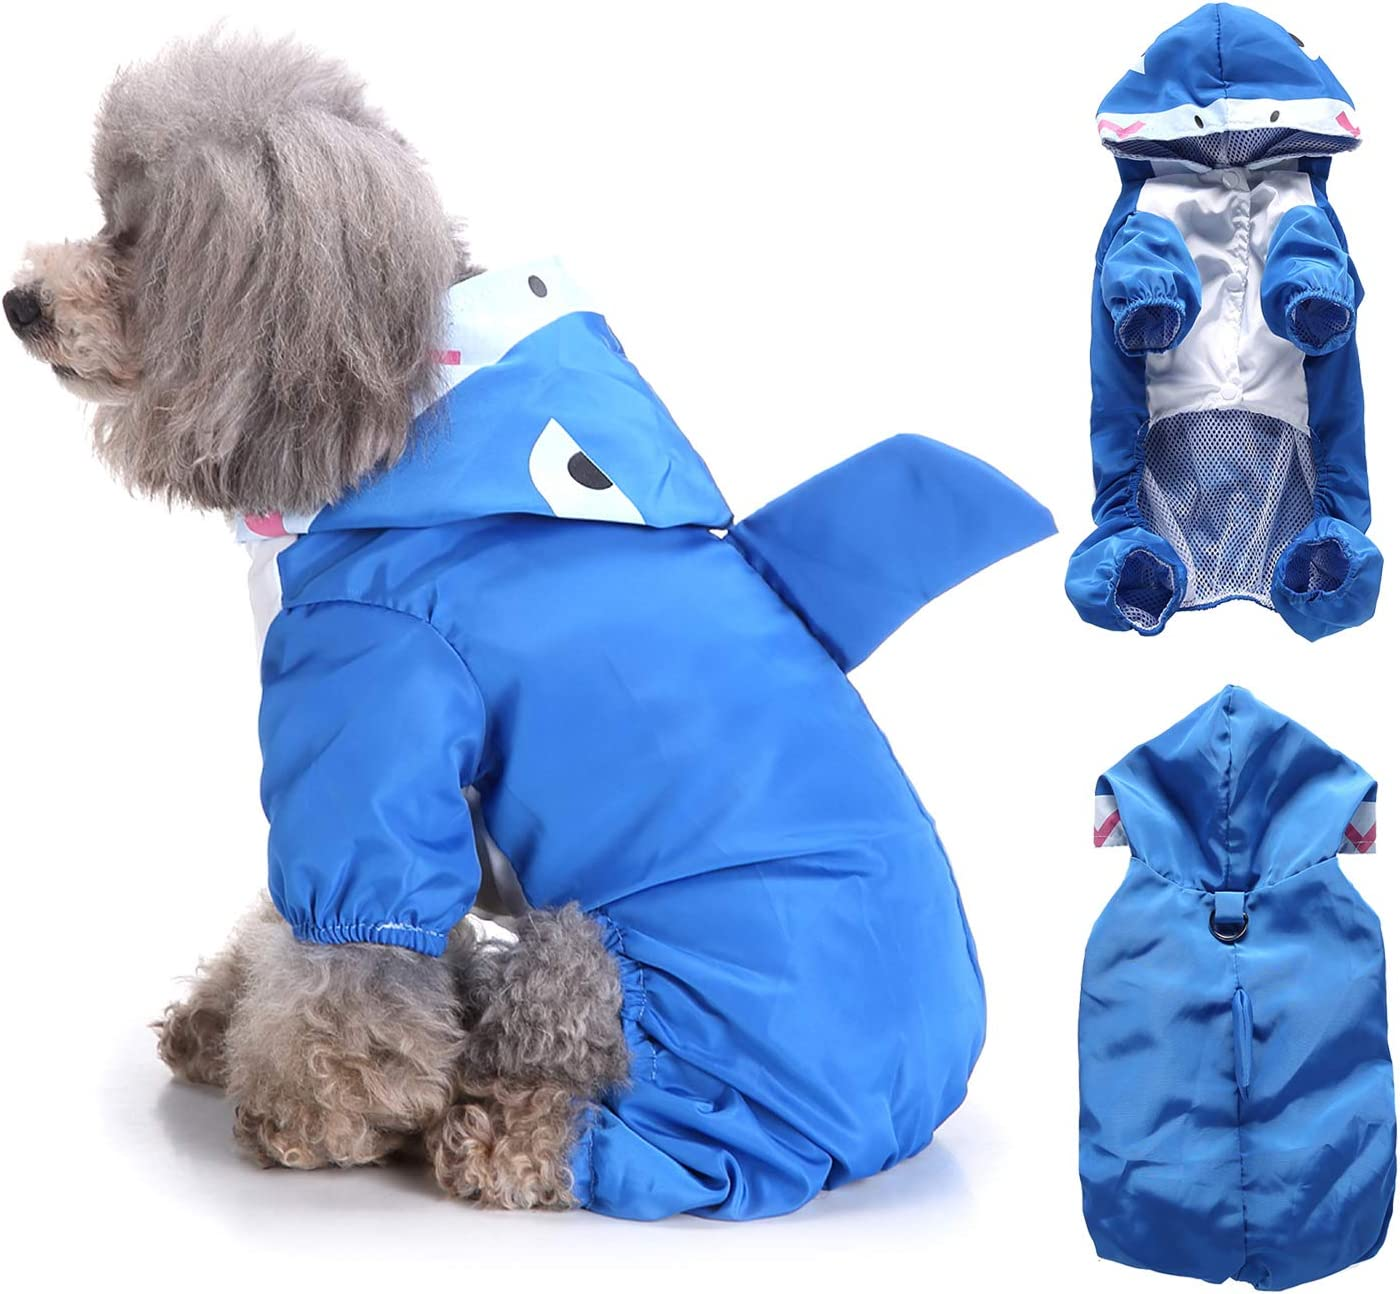 Ranphy Small Dog Hooded Raincoat Max 54% OFF Pet Cat Rain Waterproof Sale Jacket